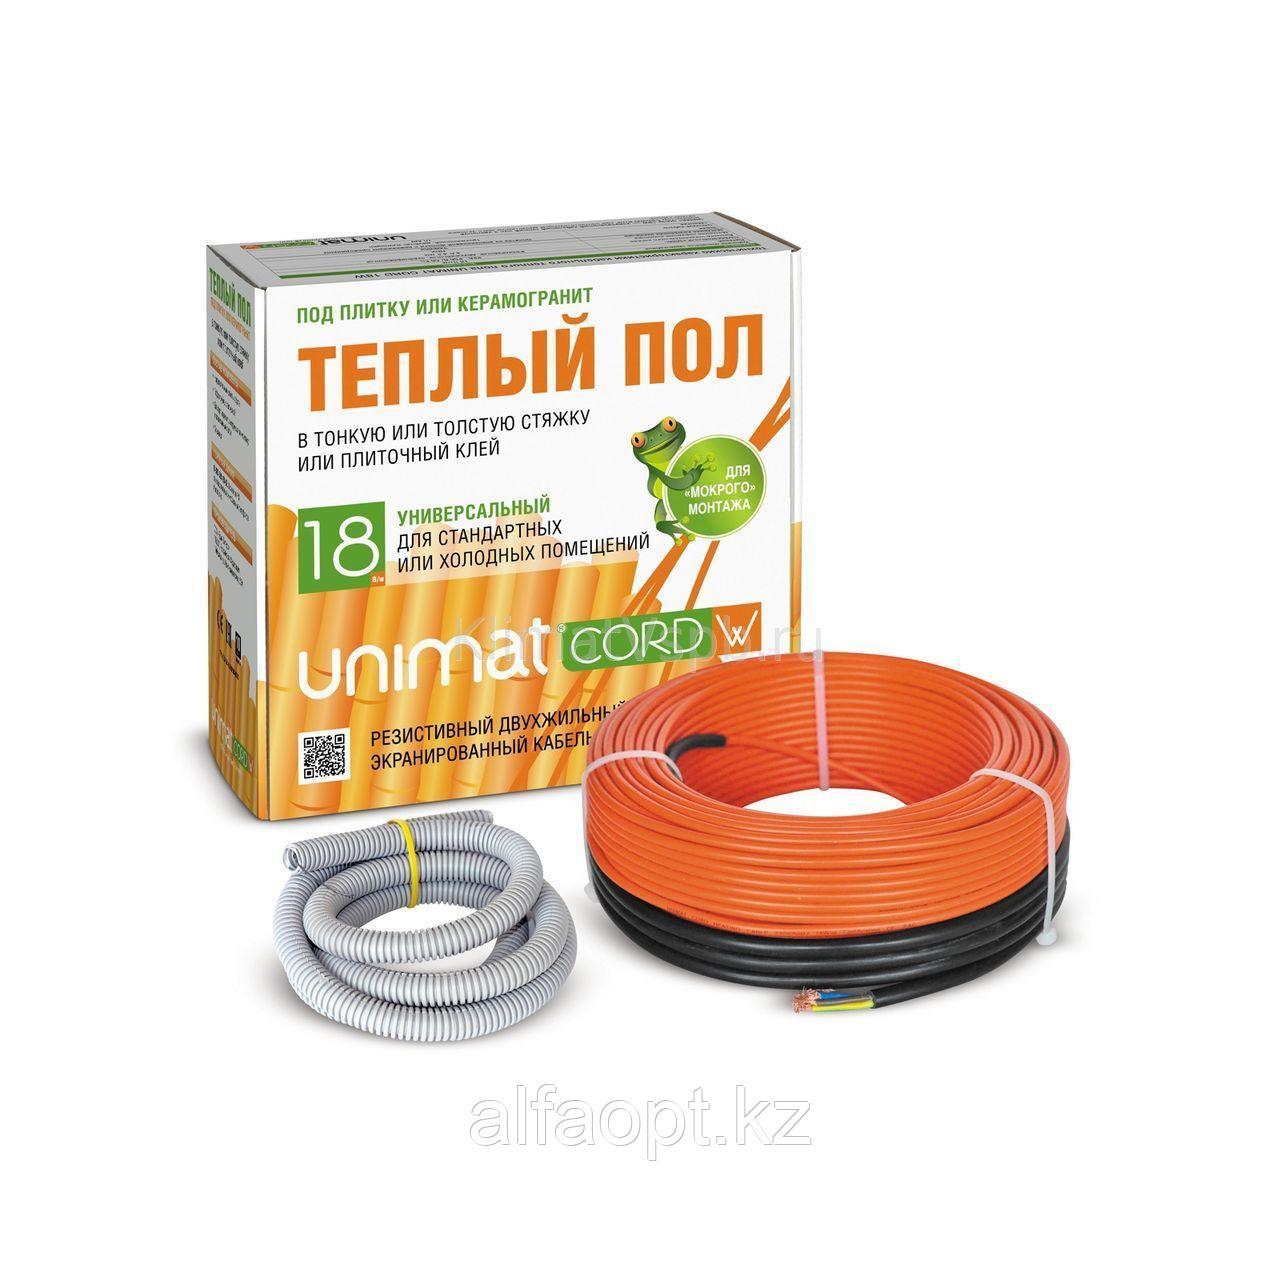 Комплект теплого пола Unimat CORD 18W-10